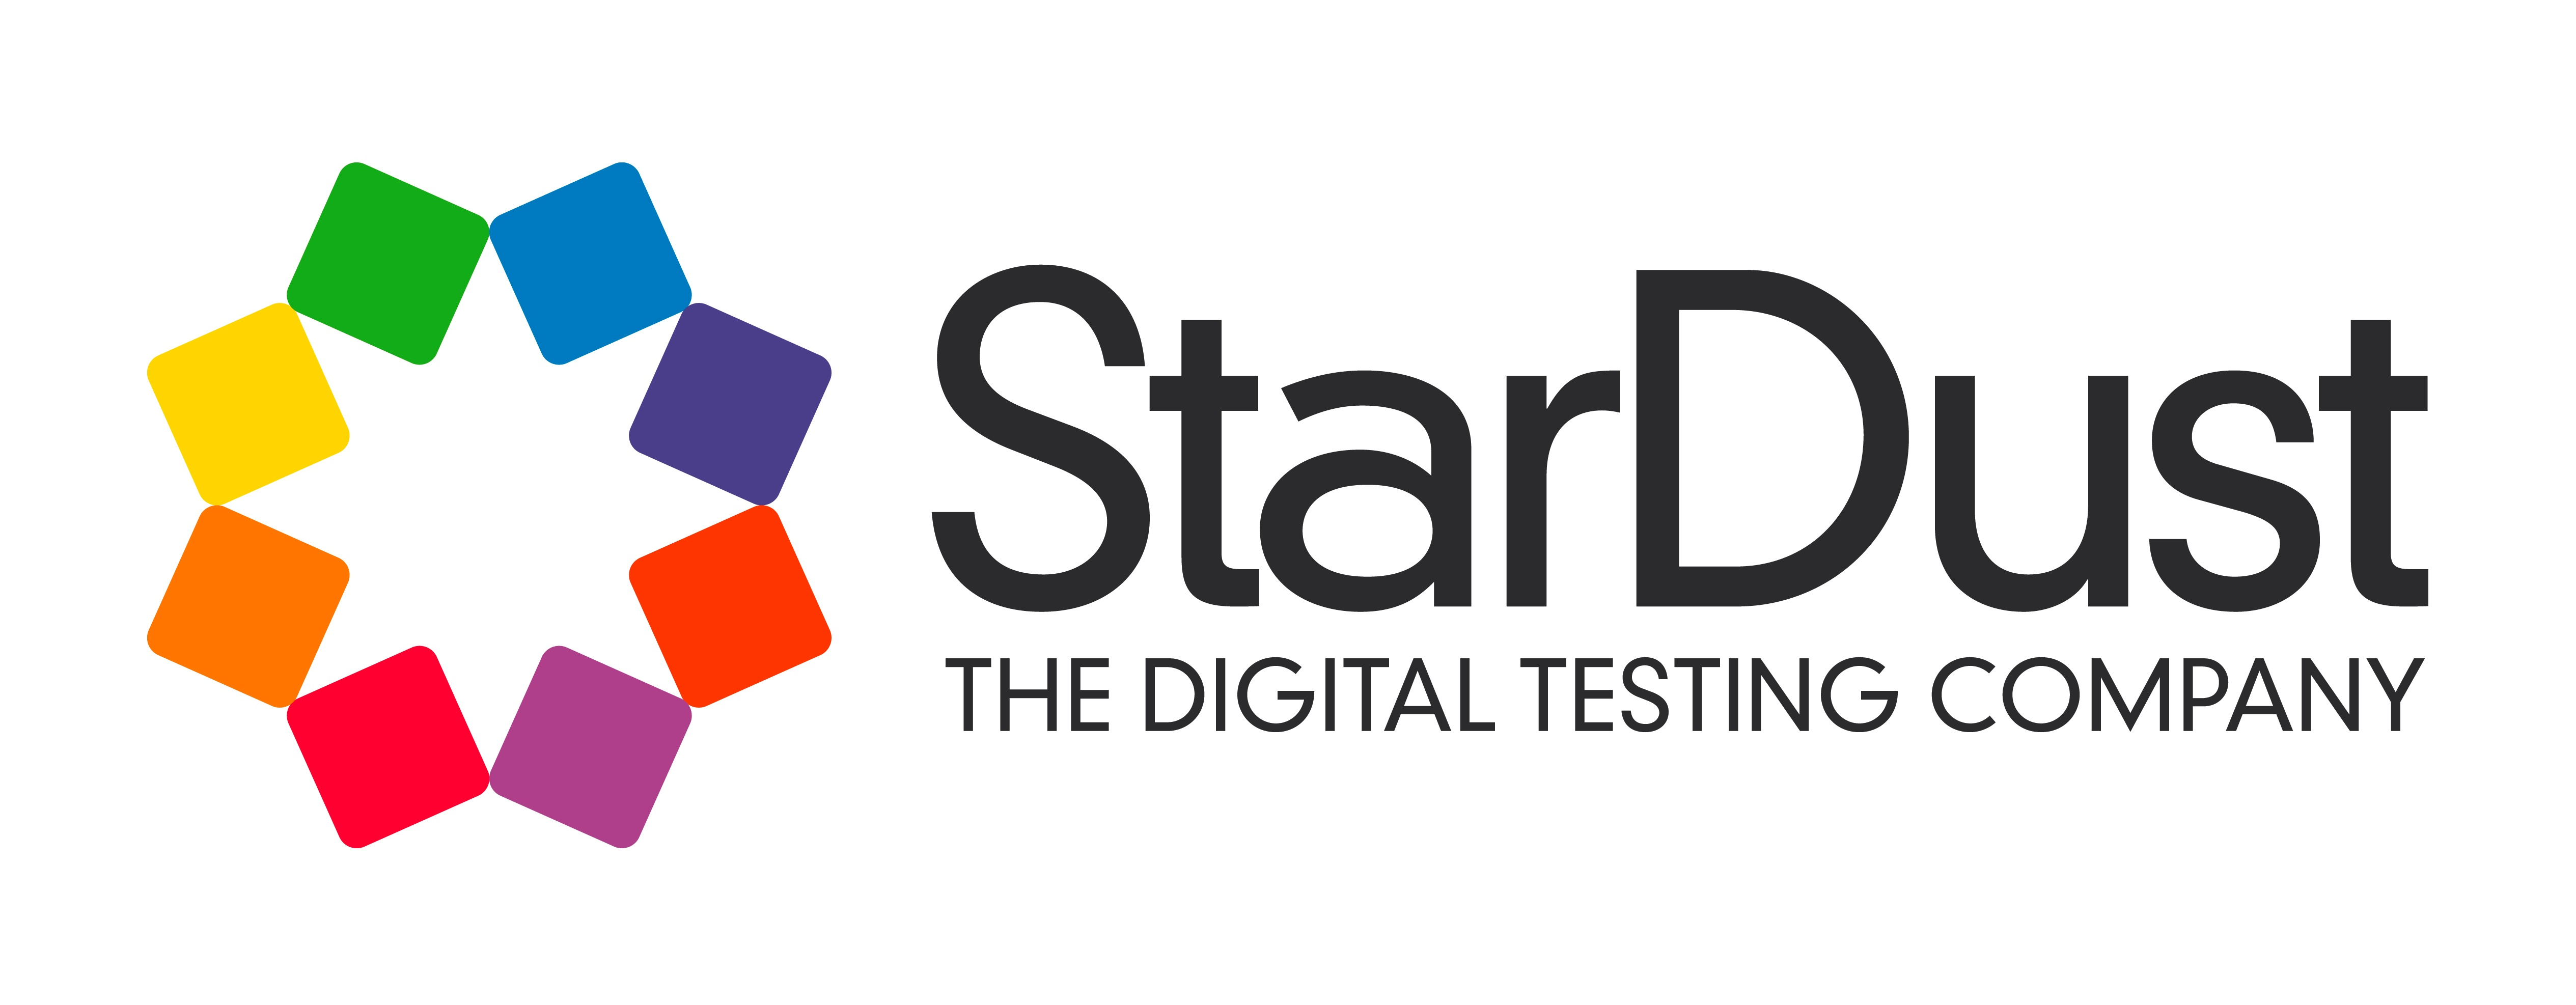 stardust_logoRVB.jpg